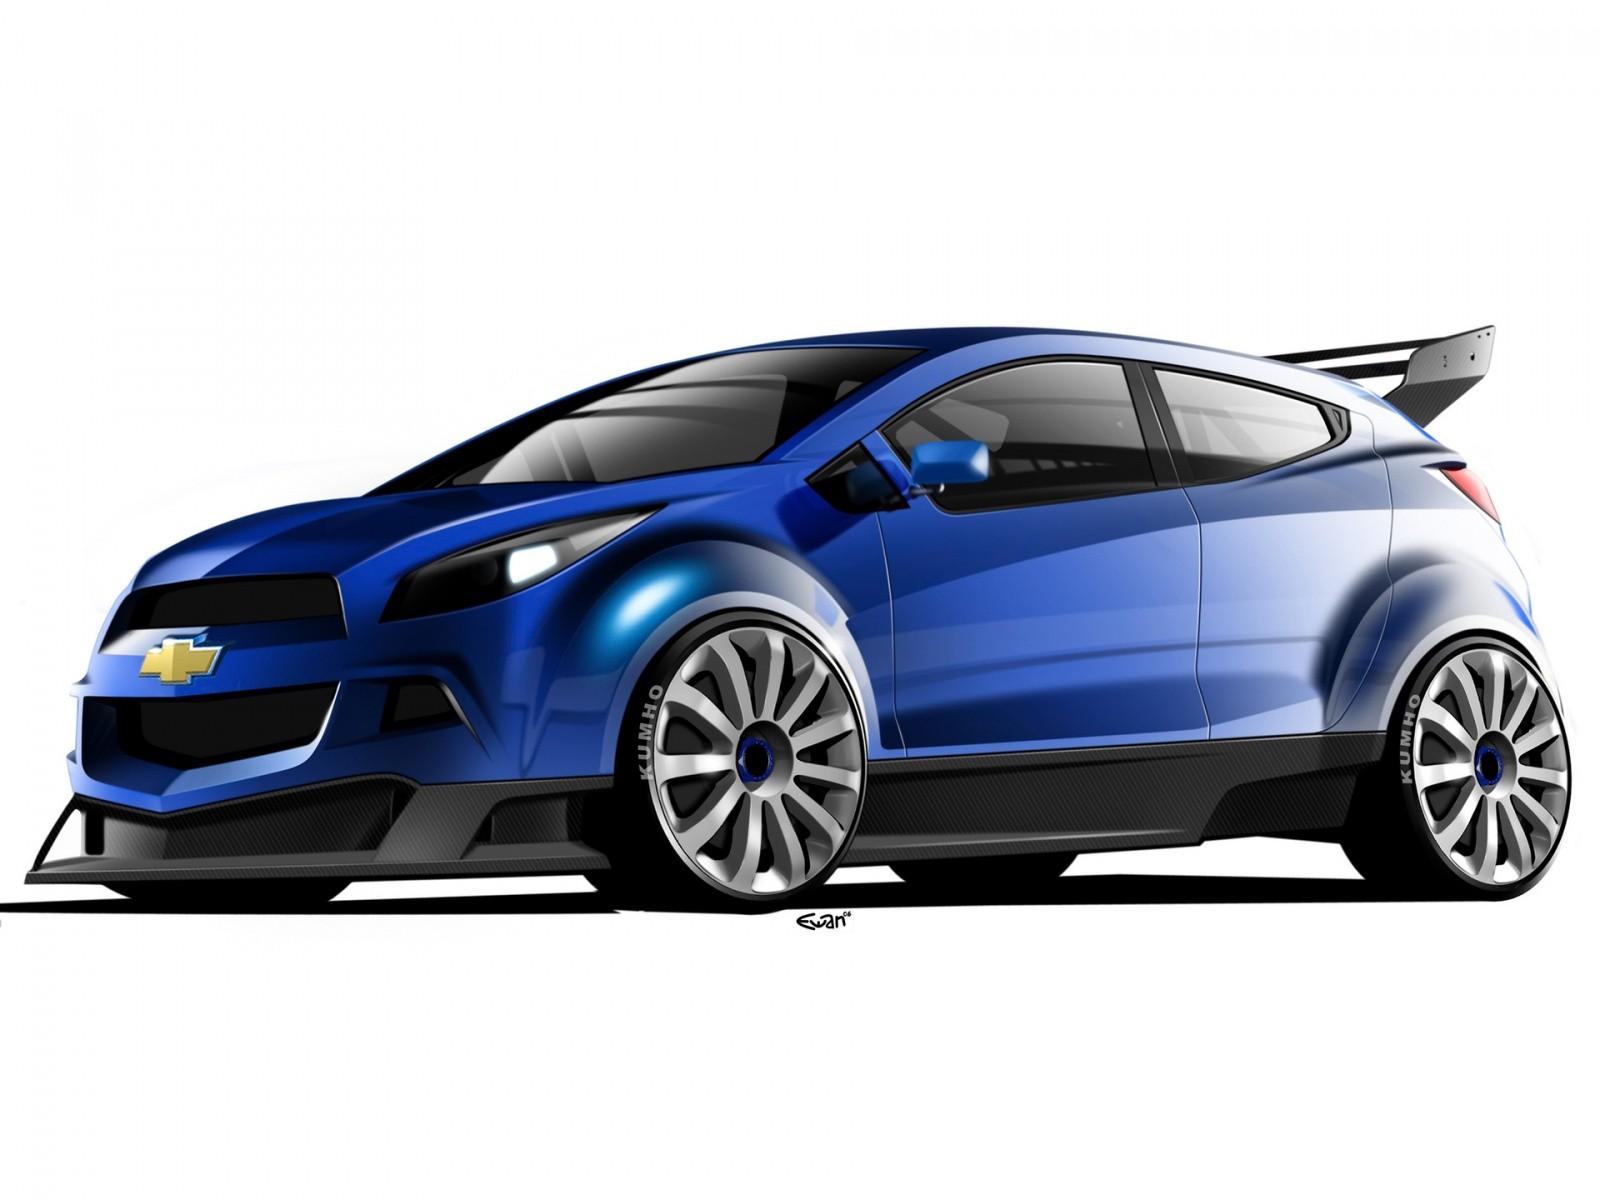 Chevrolet concept desktop wallpaper 30623-1-